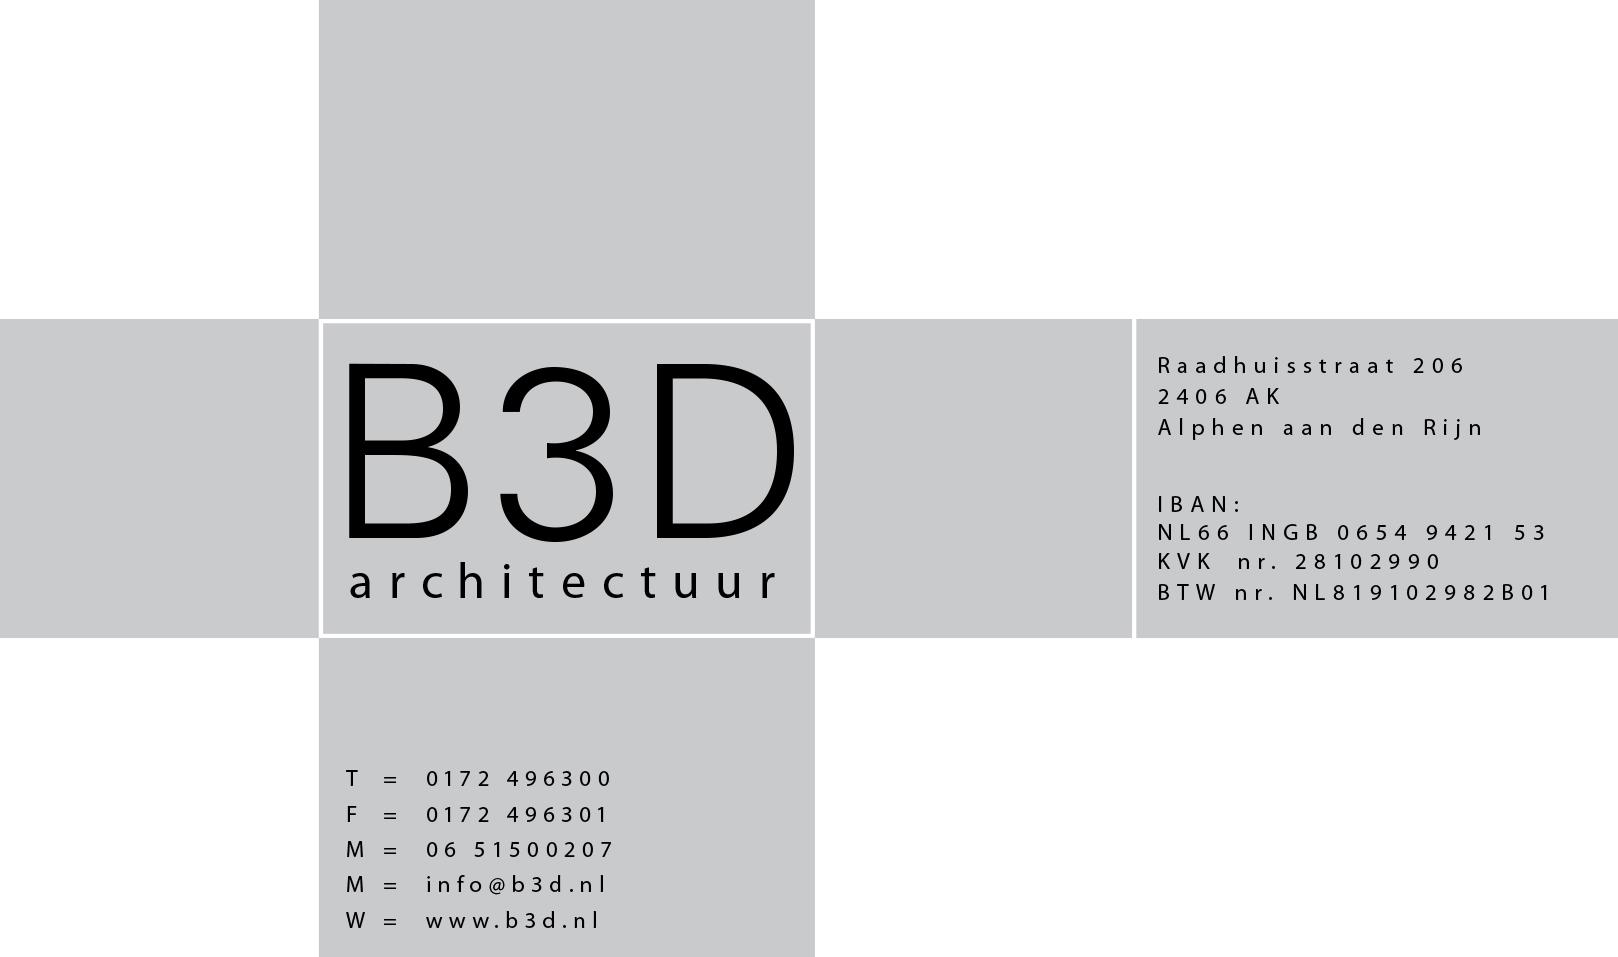 Architectenweb vacature overzicht.